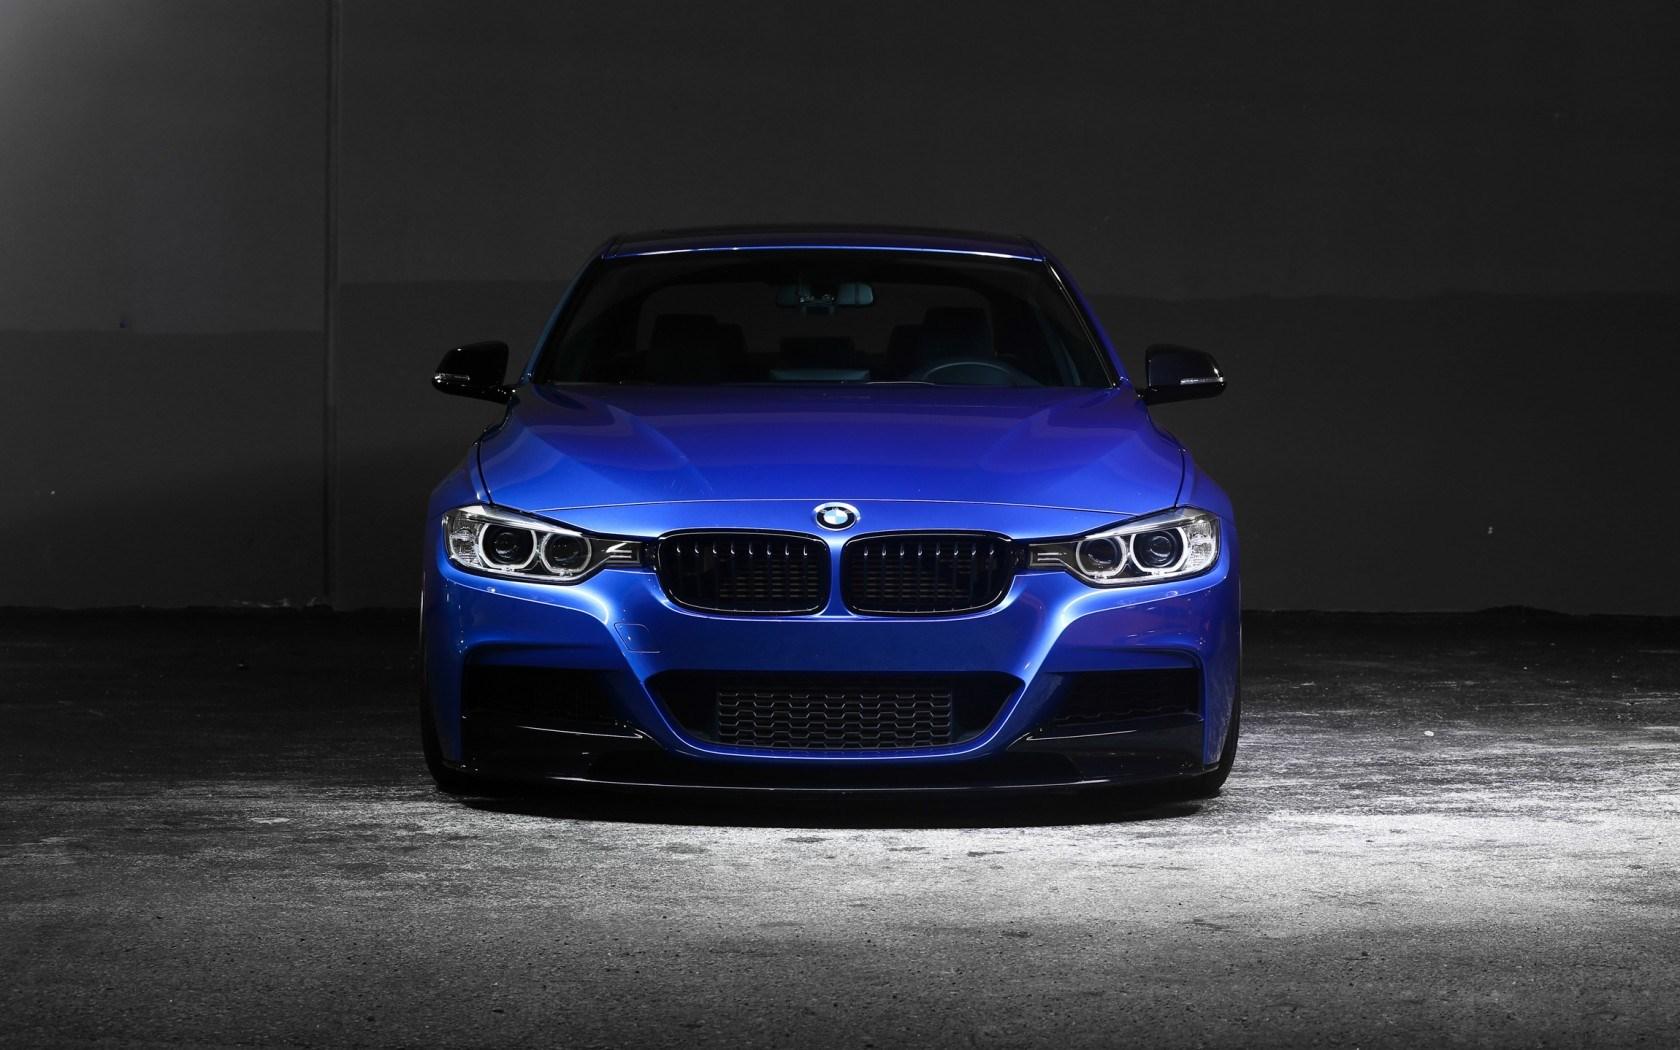 BMW 3 Series 335i F30 Blue Car Front